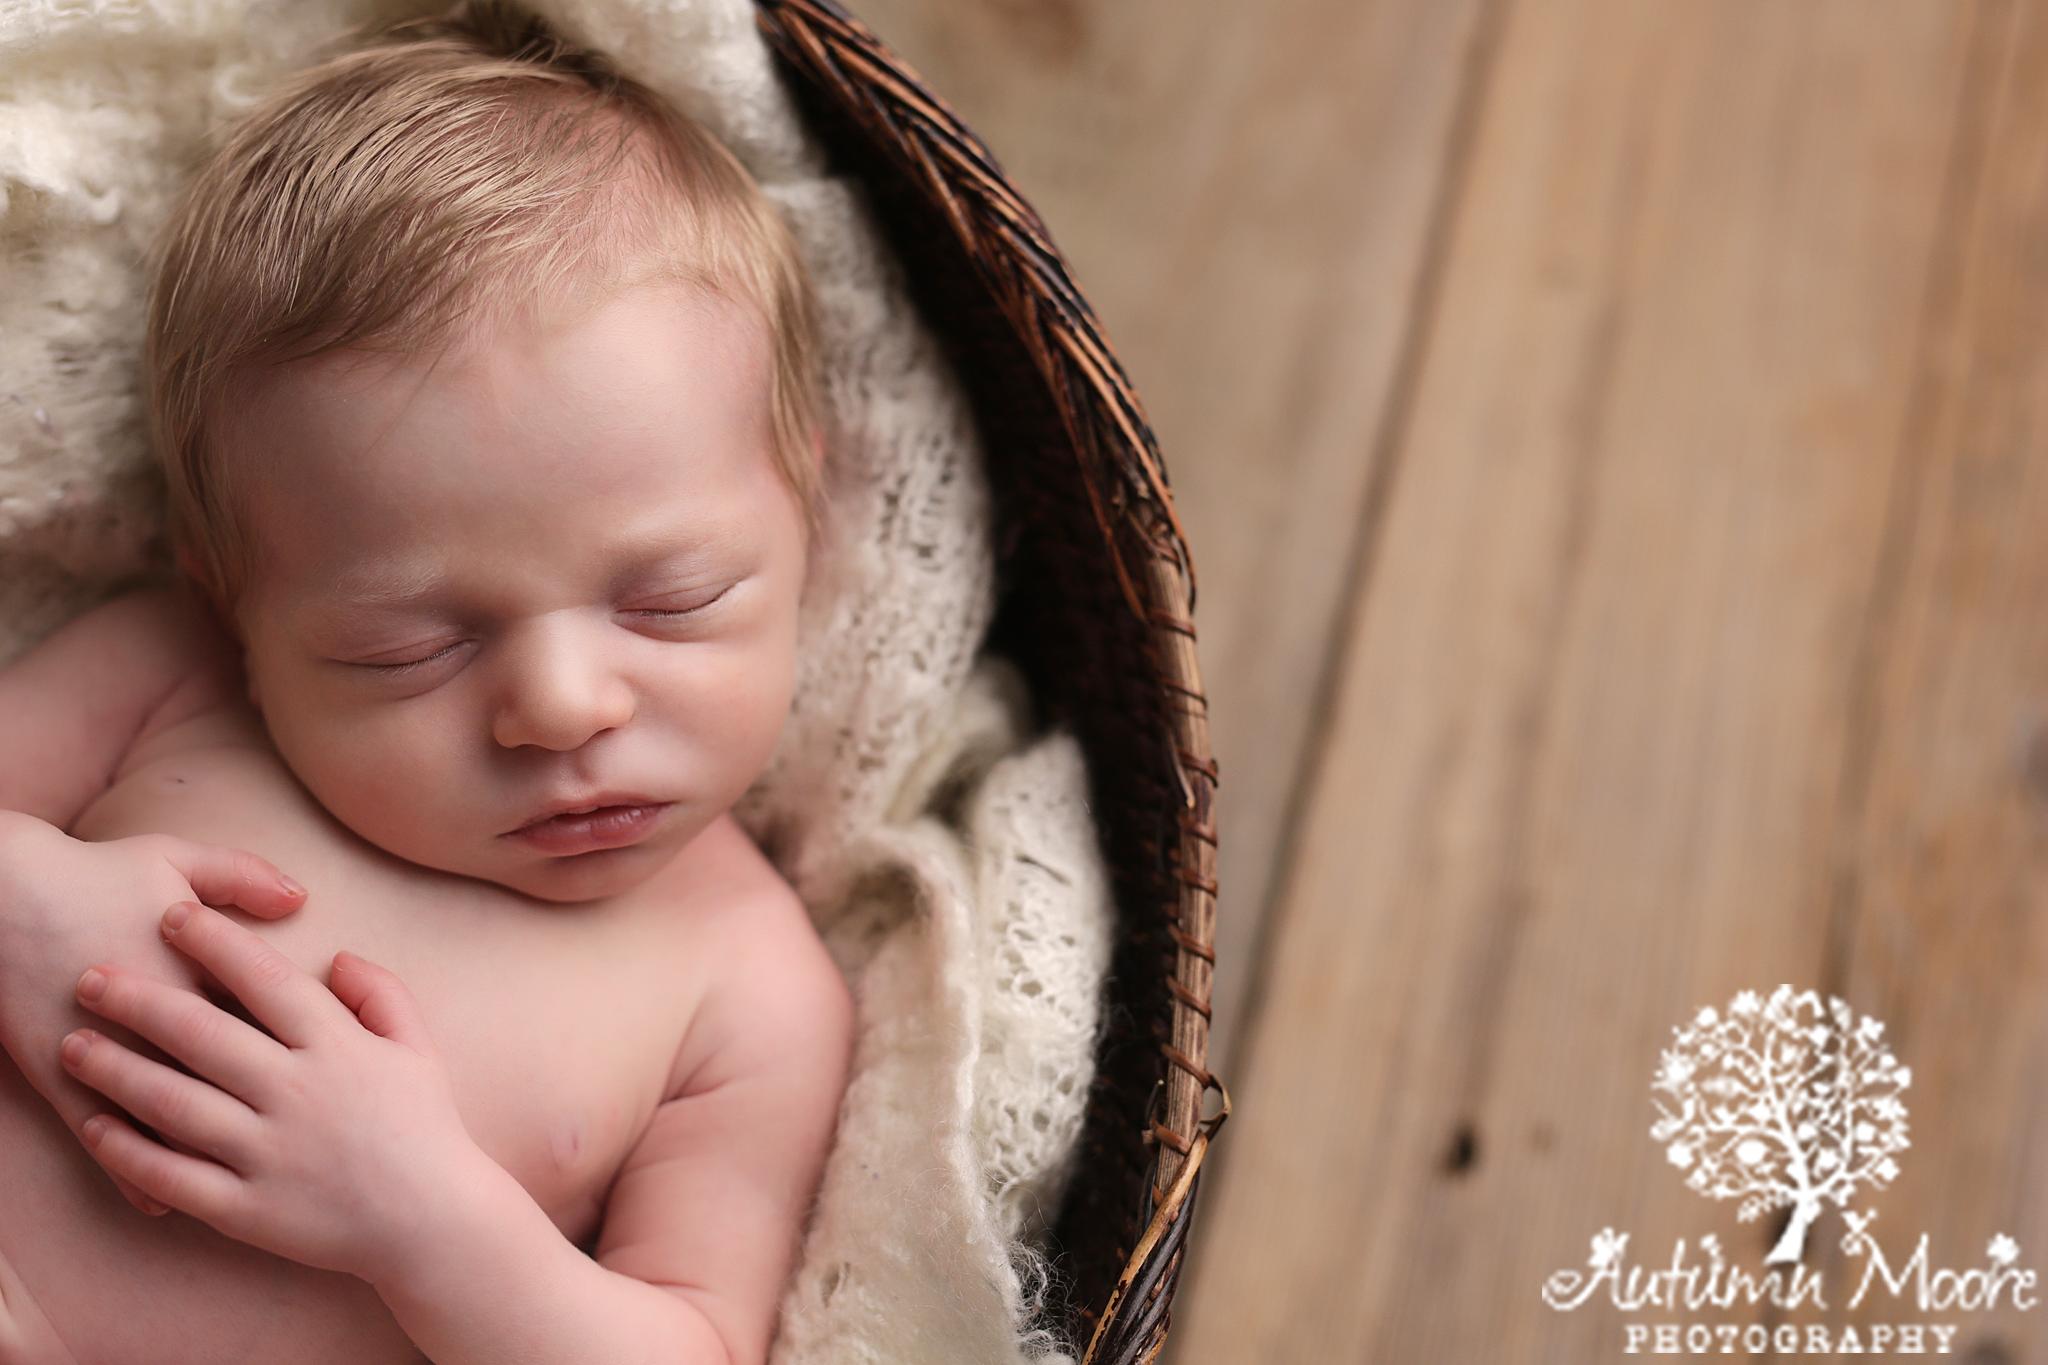 Mr J Harrah Okc Edmond Newborn Photography Newborn Newborn Photography Beautiful Babies